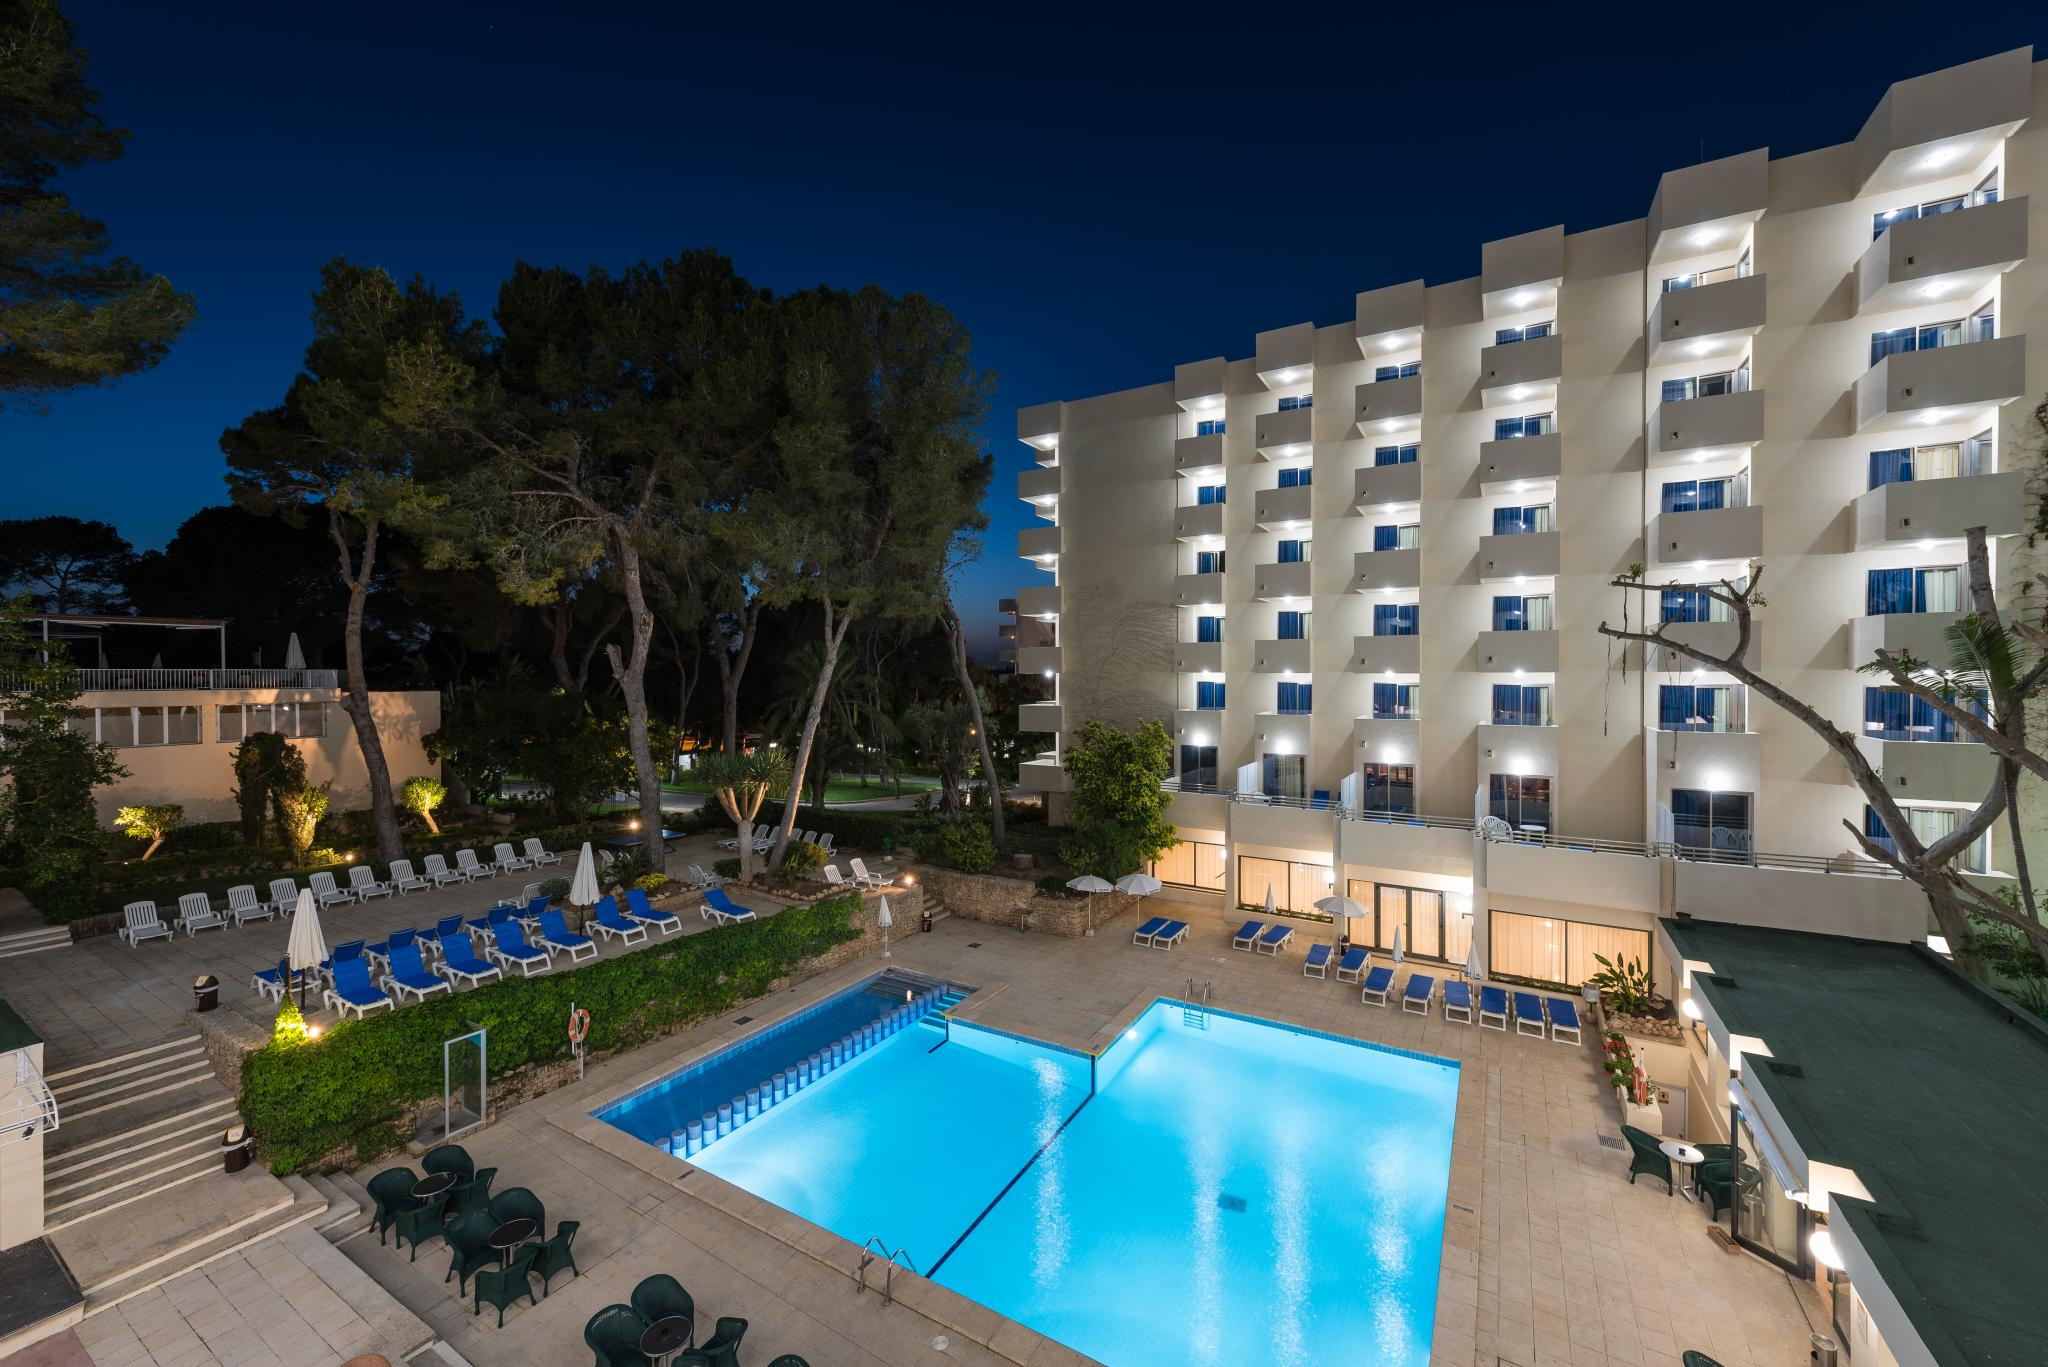 Hotel Delta neu eröffnet » Tourismus » Nachrichten » Mallorca Magazin